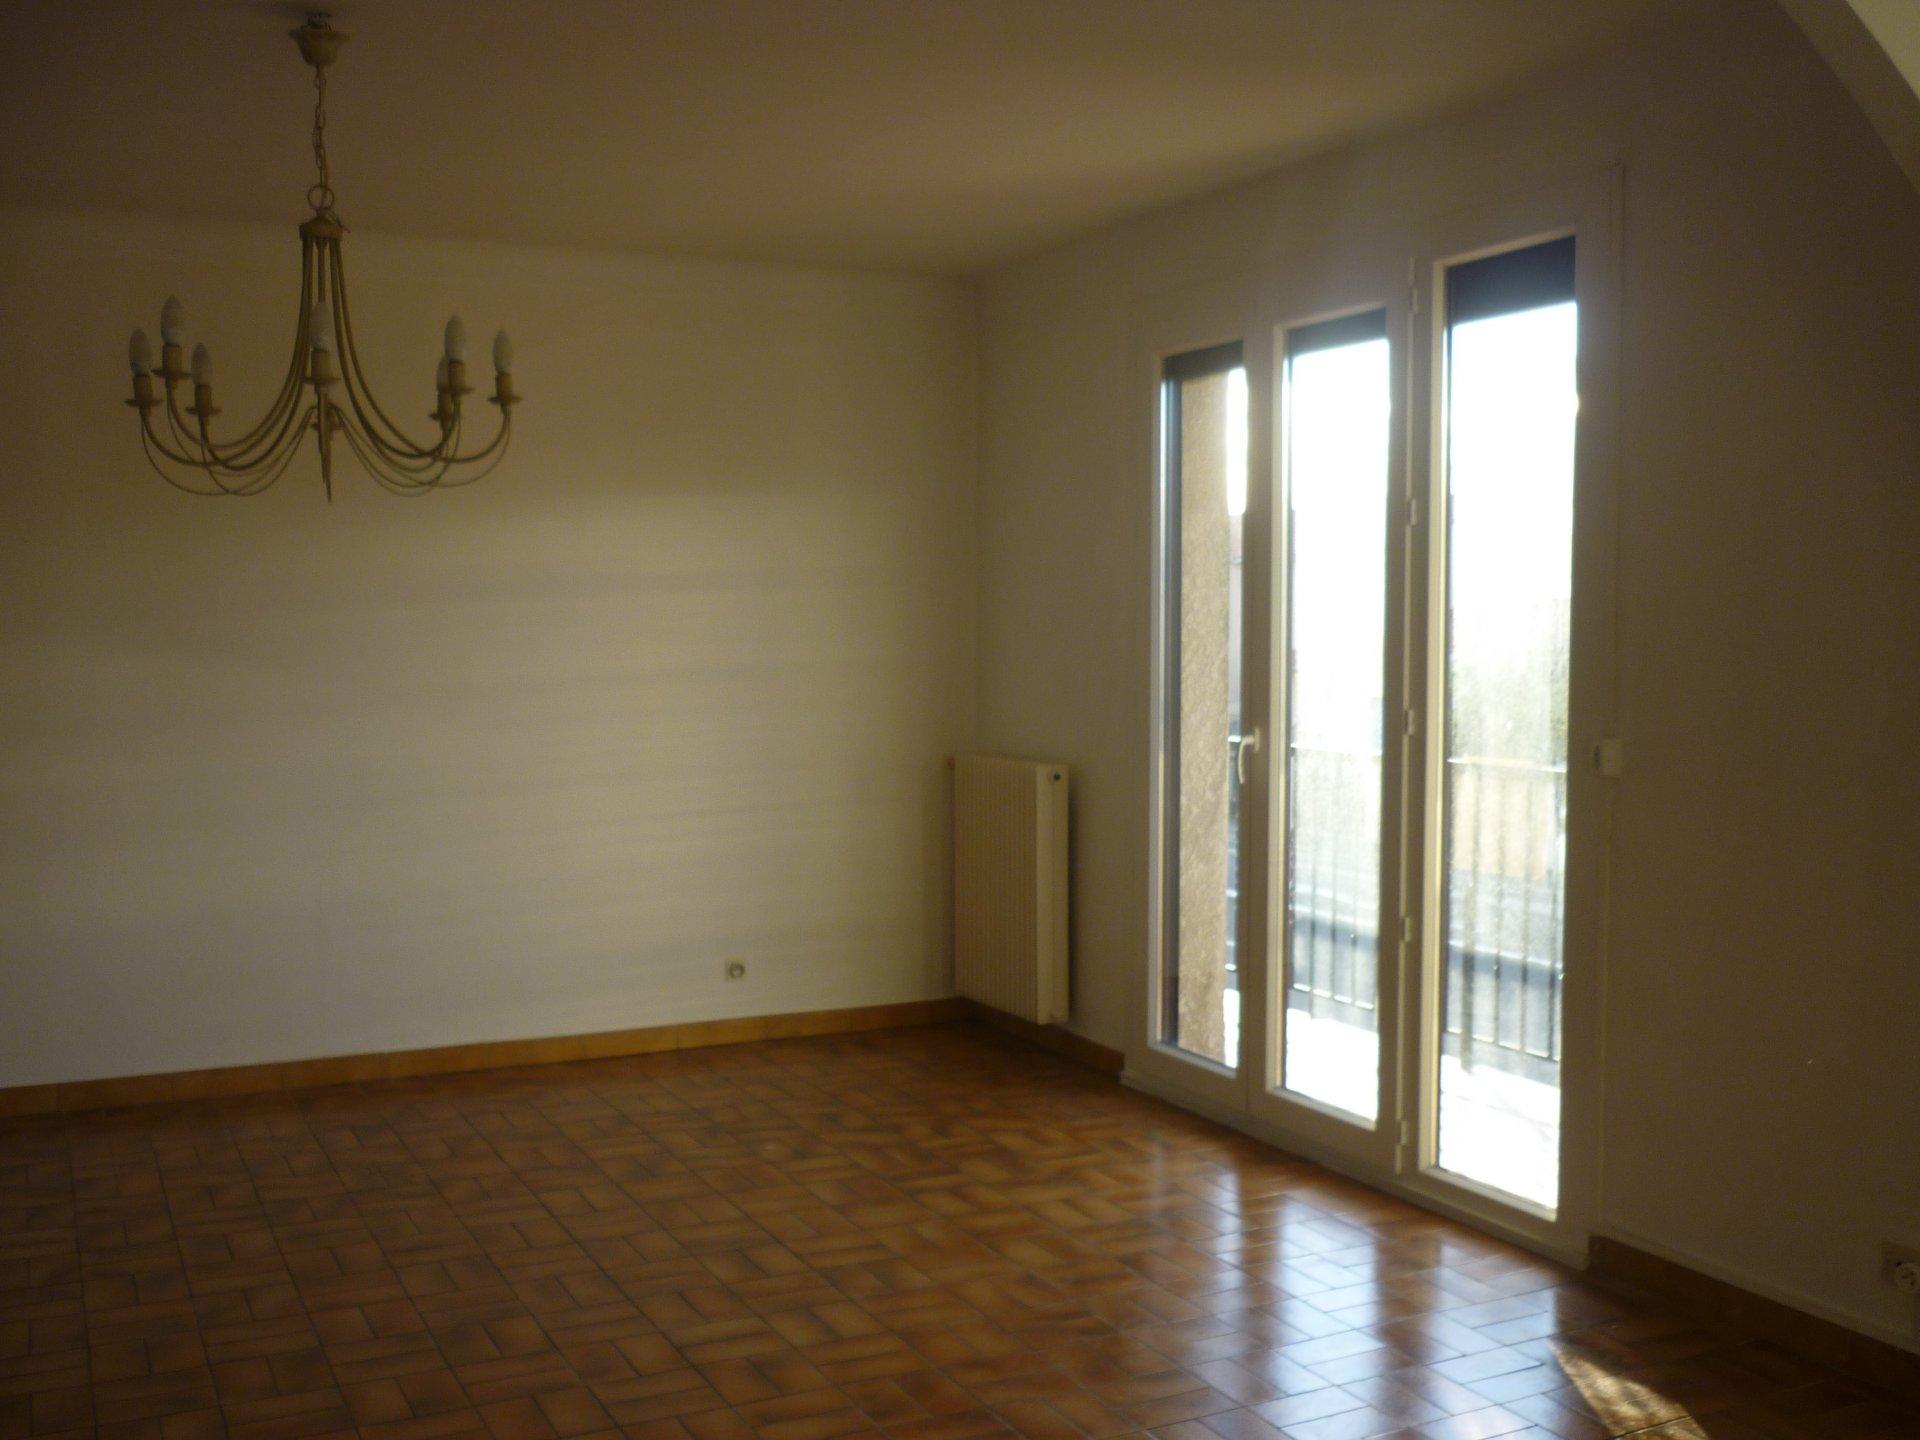 FLAT in Perpignan - dbi002545